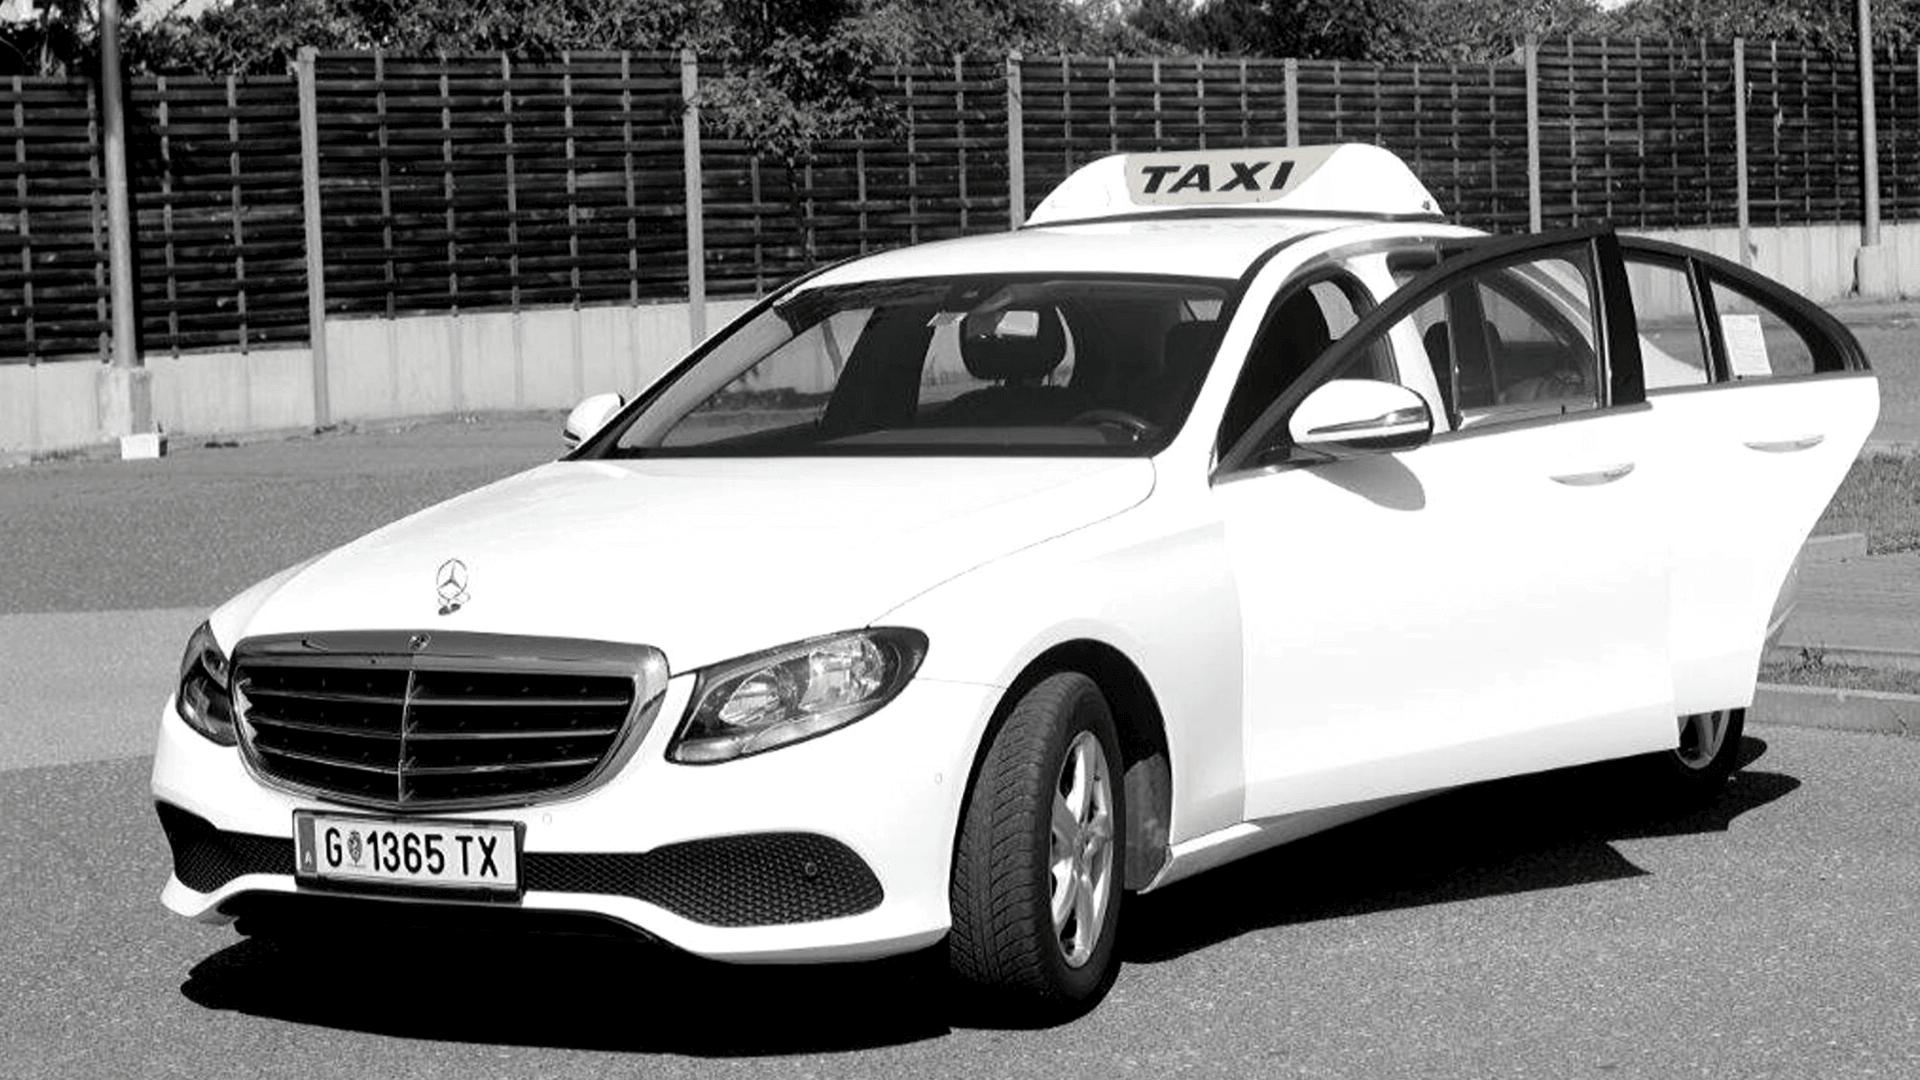 hire-a-car_mercedes-e-taxi in weiss